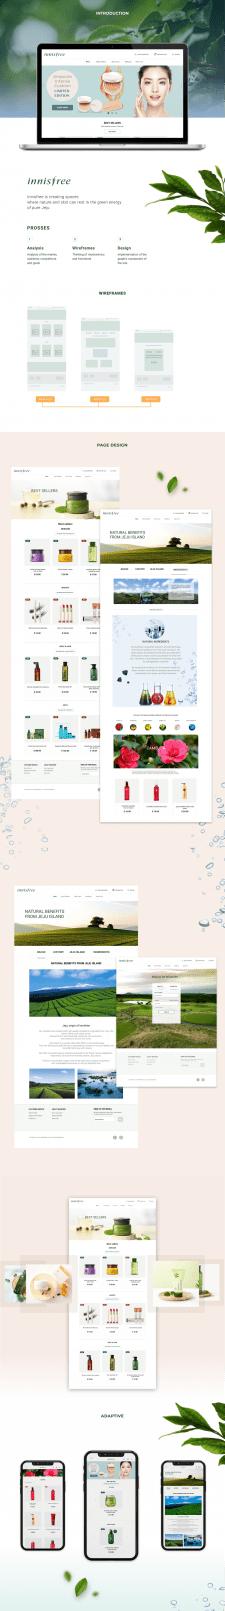 Korean cosmetics store website design